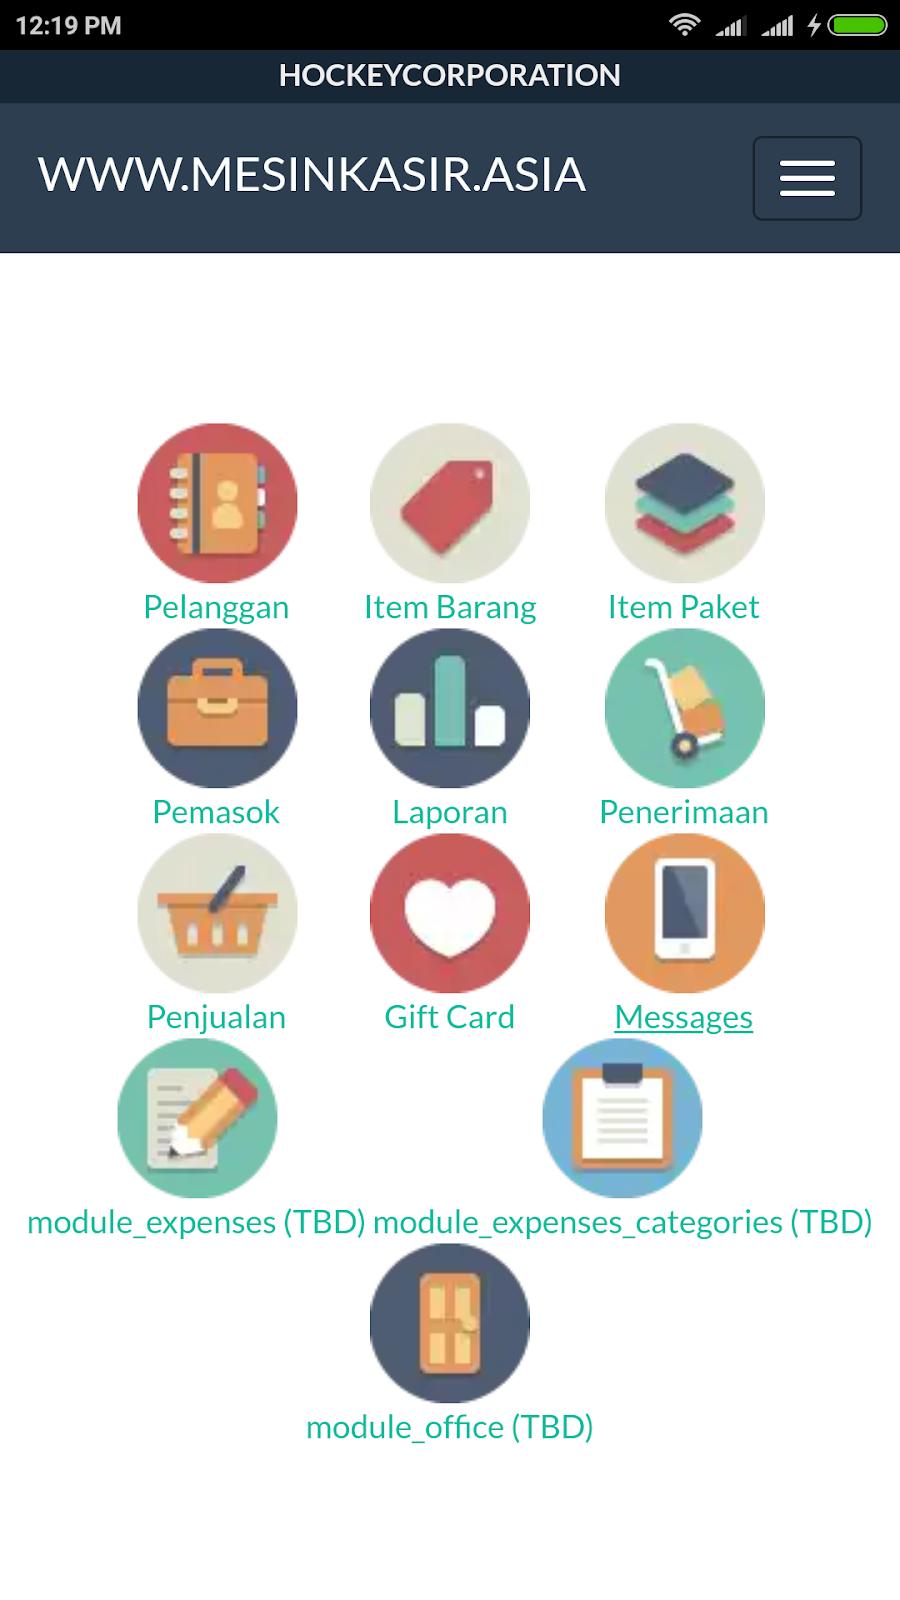 android, aplikasi kasir, cetakan, clouds, invoice, kasir online, LAPORAN, MESIN KASIR, mesin kasir online, minimum stok, online, persediaan rendah, rincian, software kasir, stok, struk kasir, update, mesin kasir online android